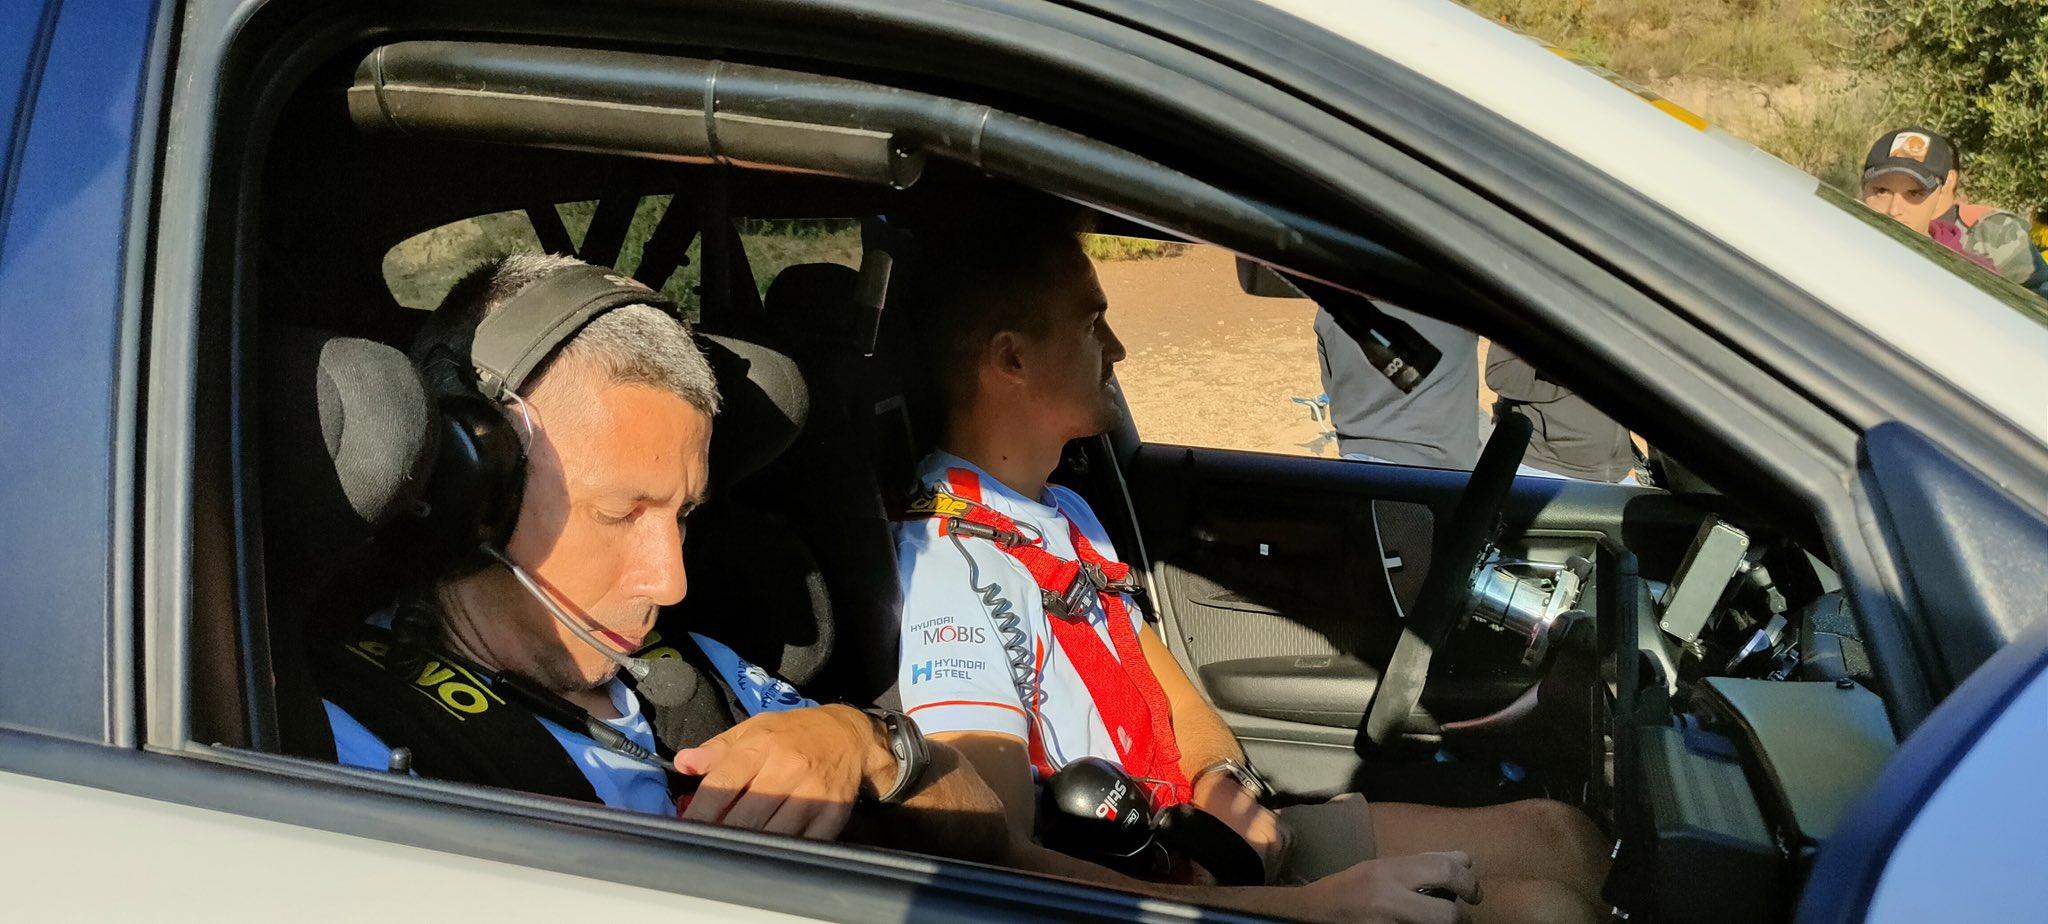 WRC: 56º RallyRACC Catalunya Costa Daurada - Rally de España [14-17 Octubre] - Página 2 FBfmxR2XMAEsx24?format=jpg&name=large